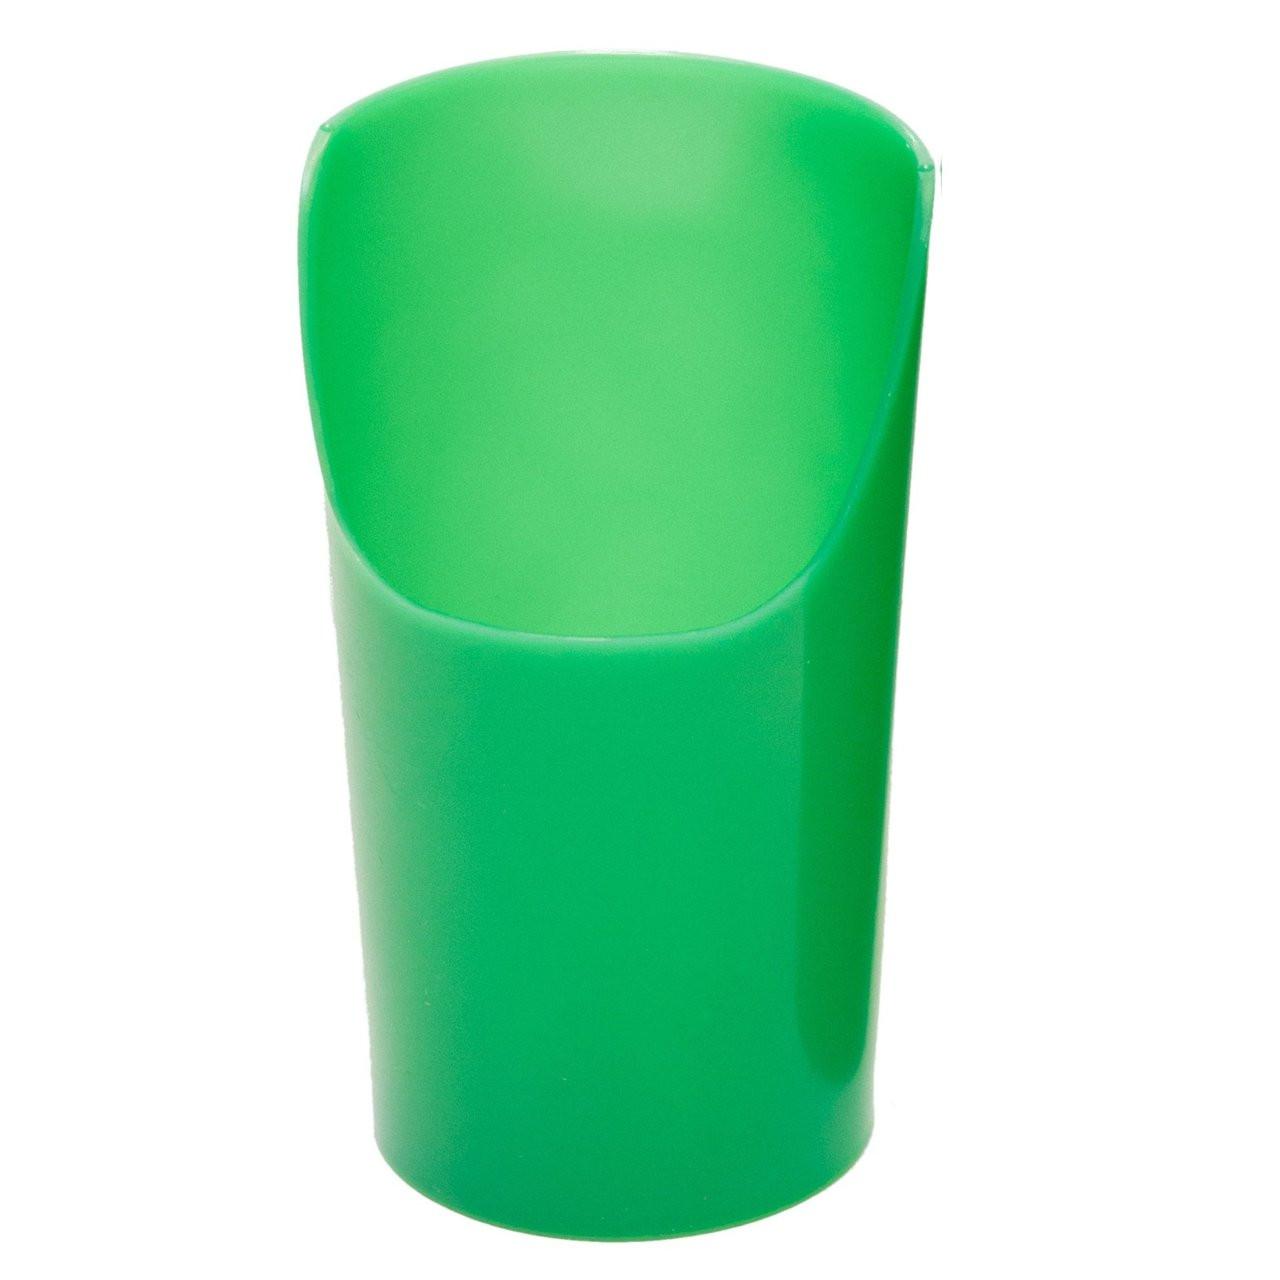 Flexi Cup - Medium